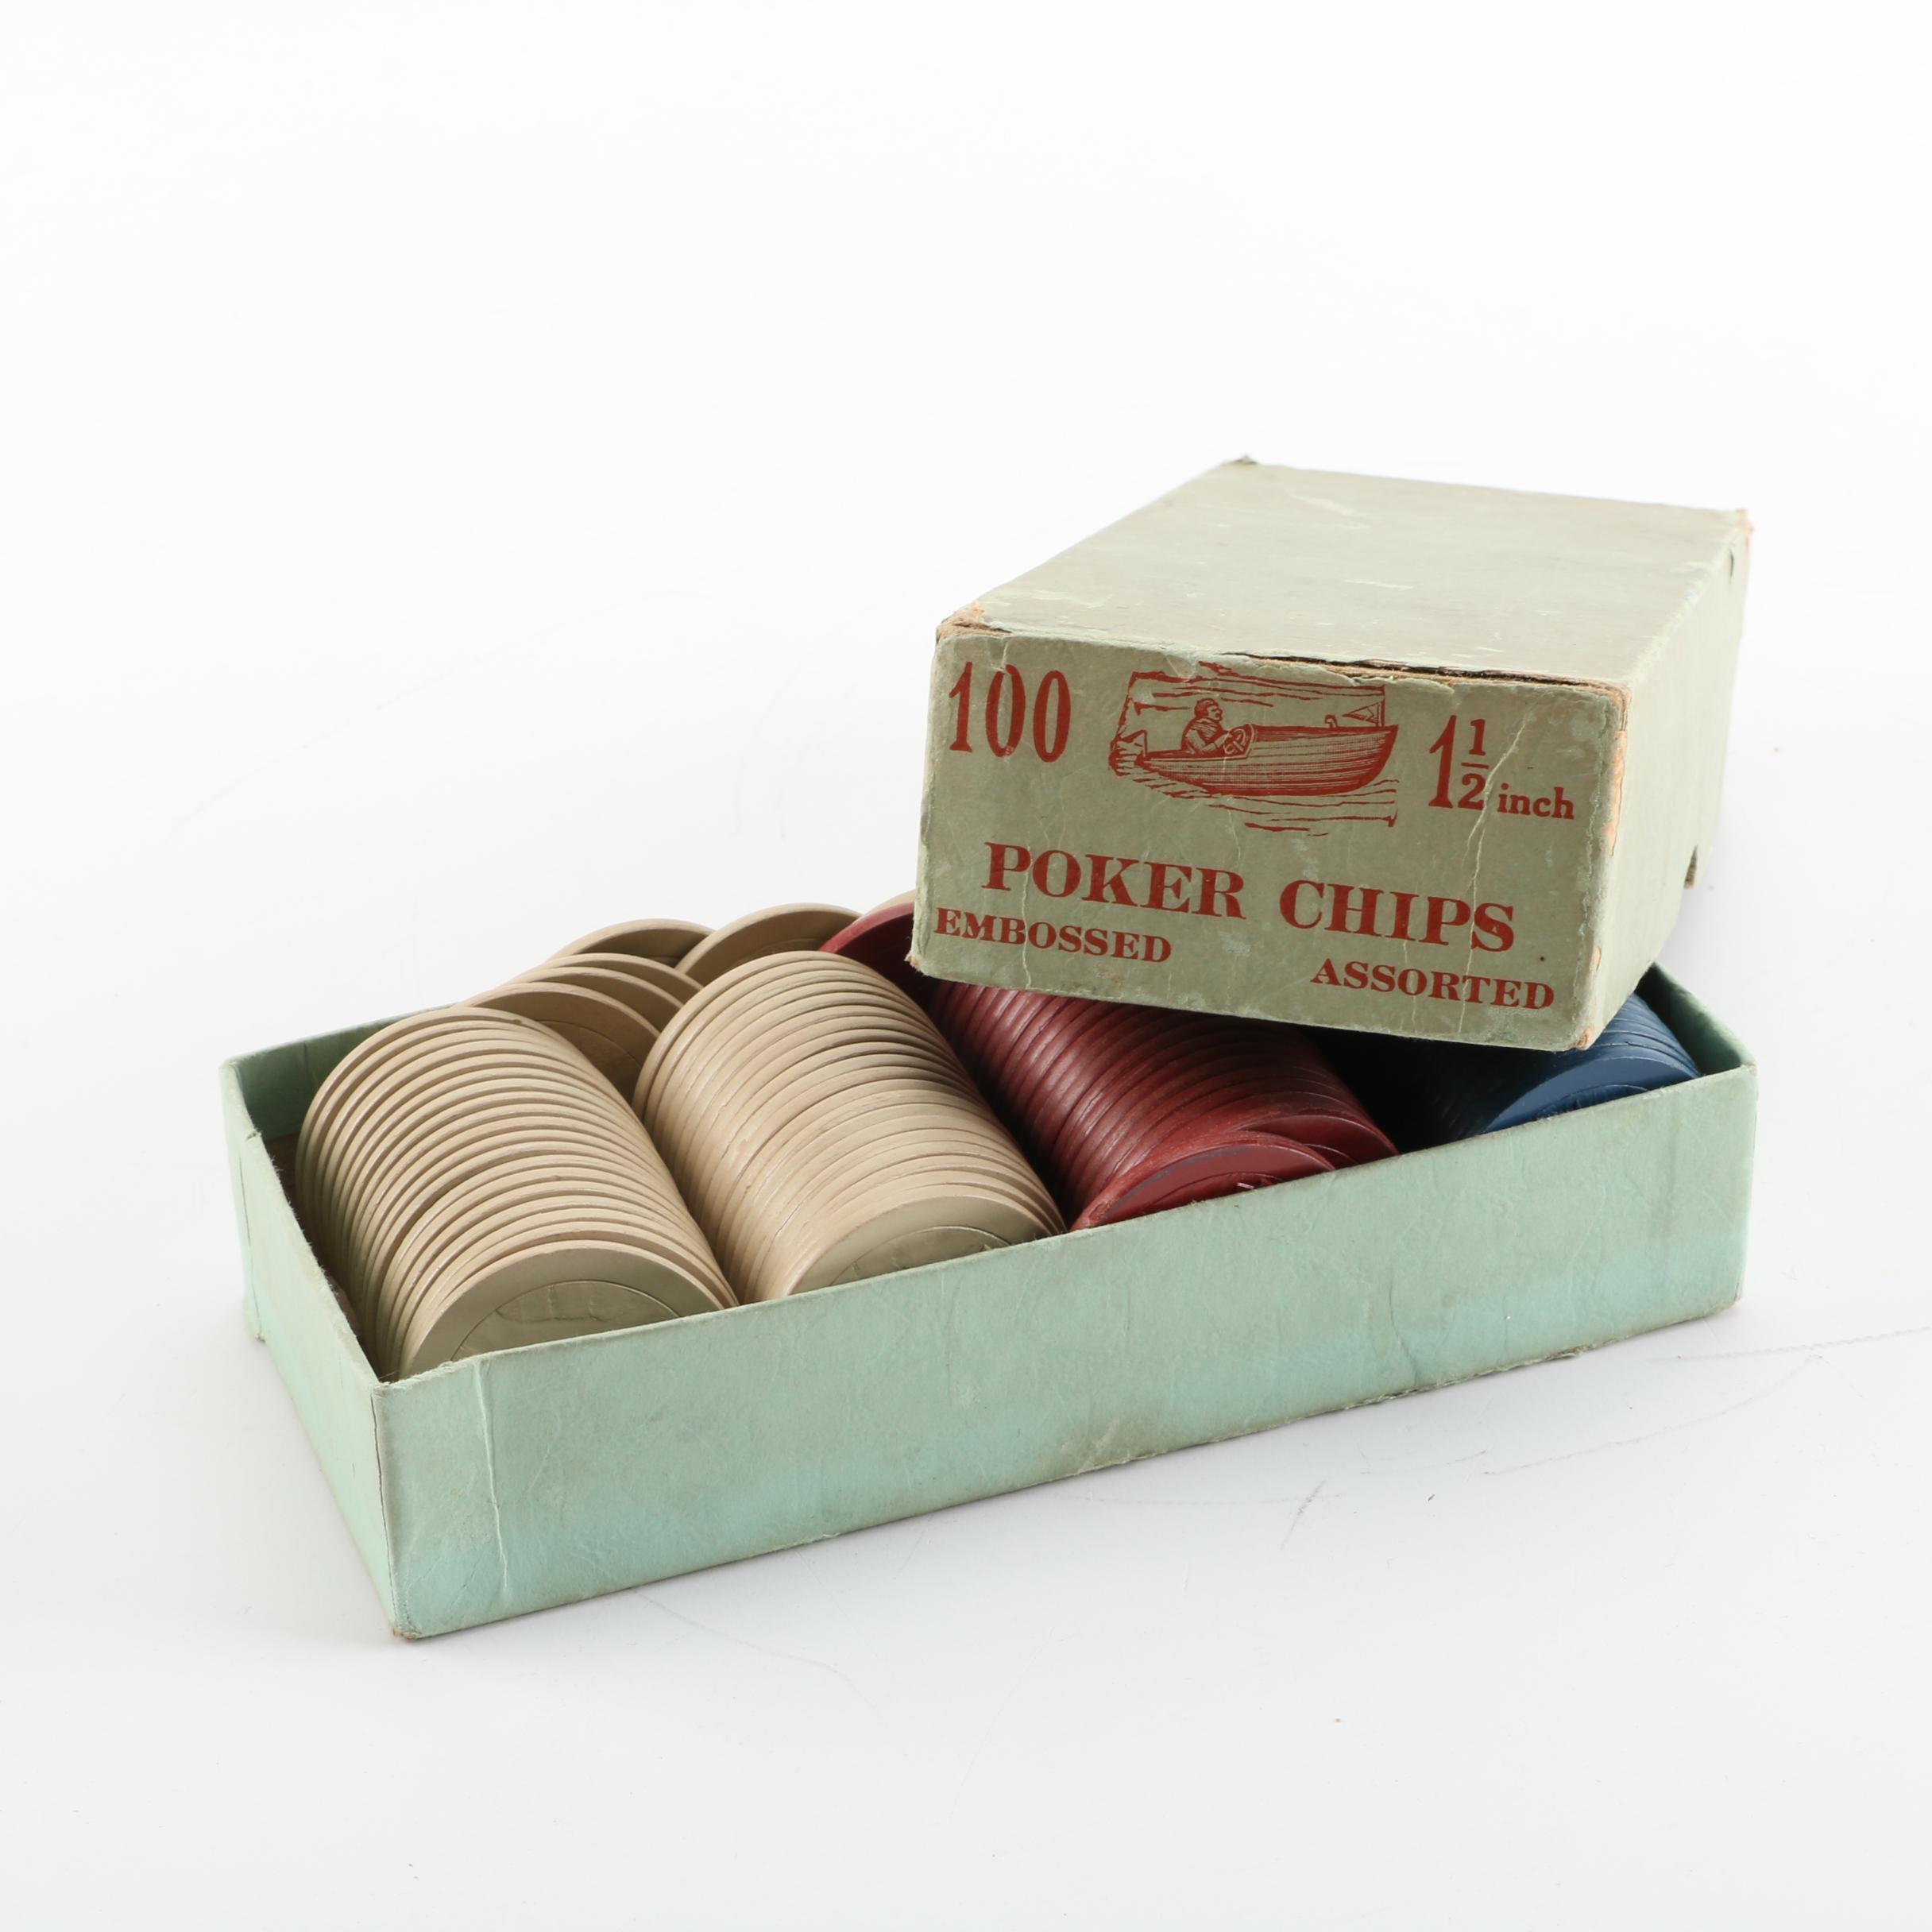 Vintage Poker Chips in Original Box